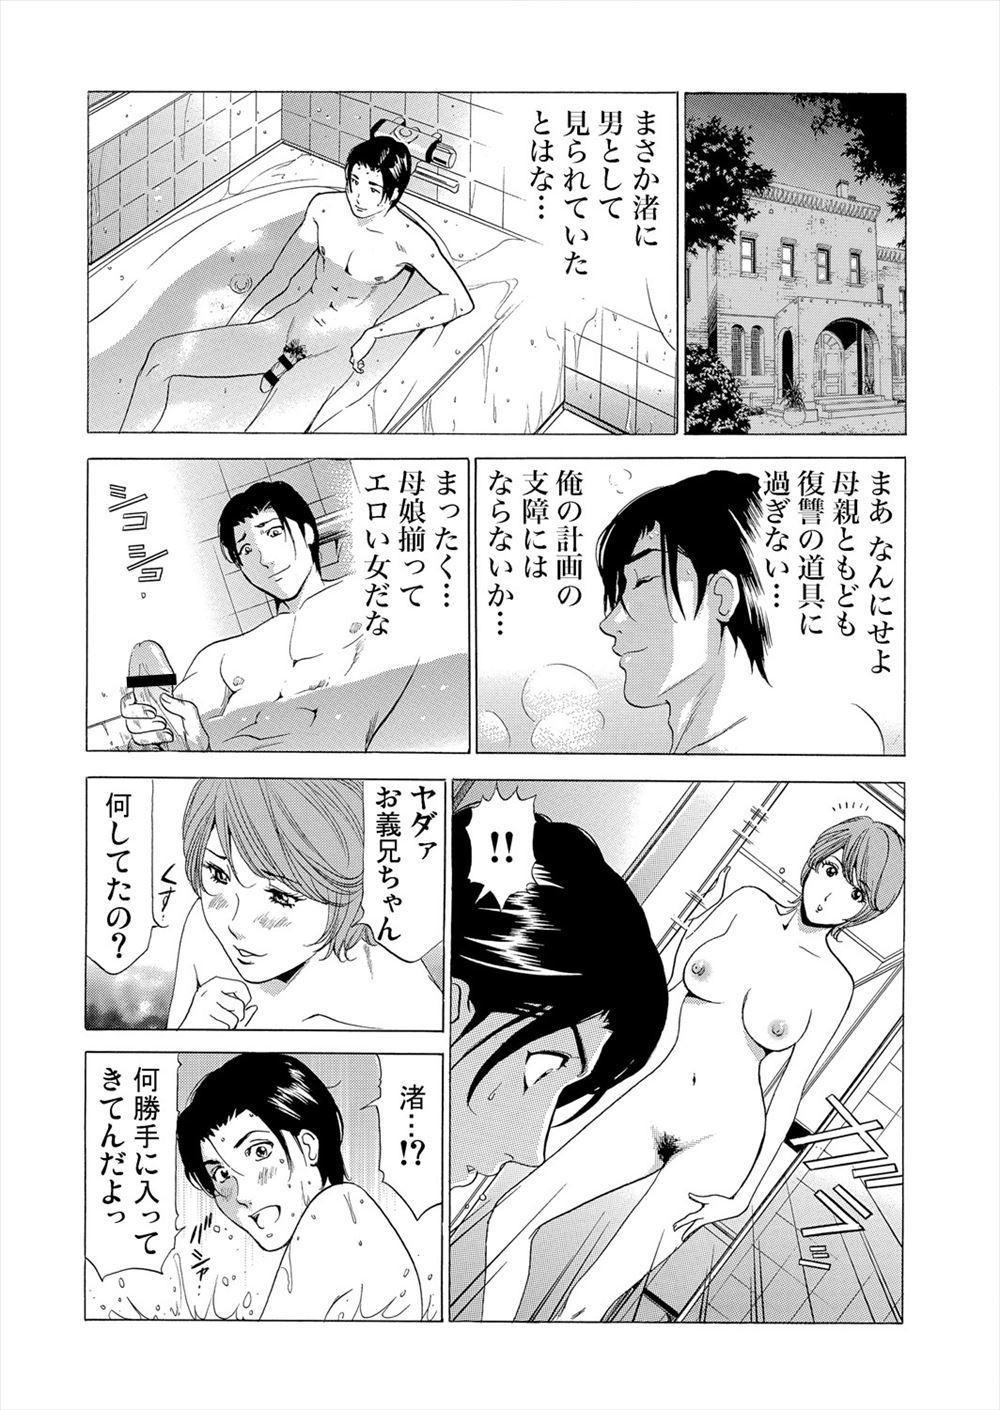 [fonteynart] Gibo netori (Mother-in-law netori) vol.2~ fukushū no yakata 10